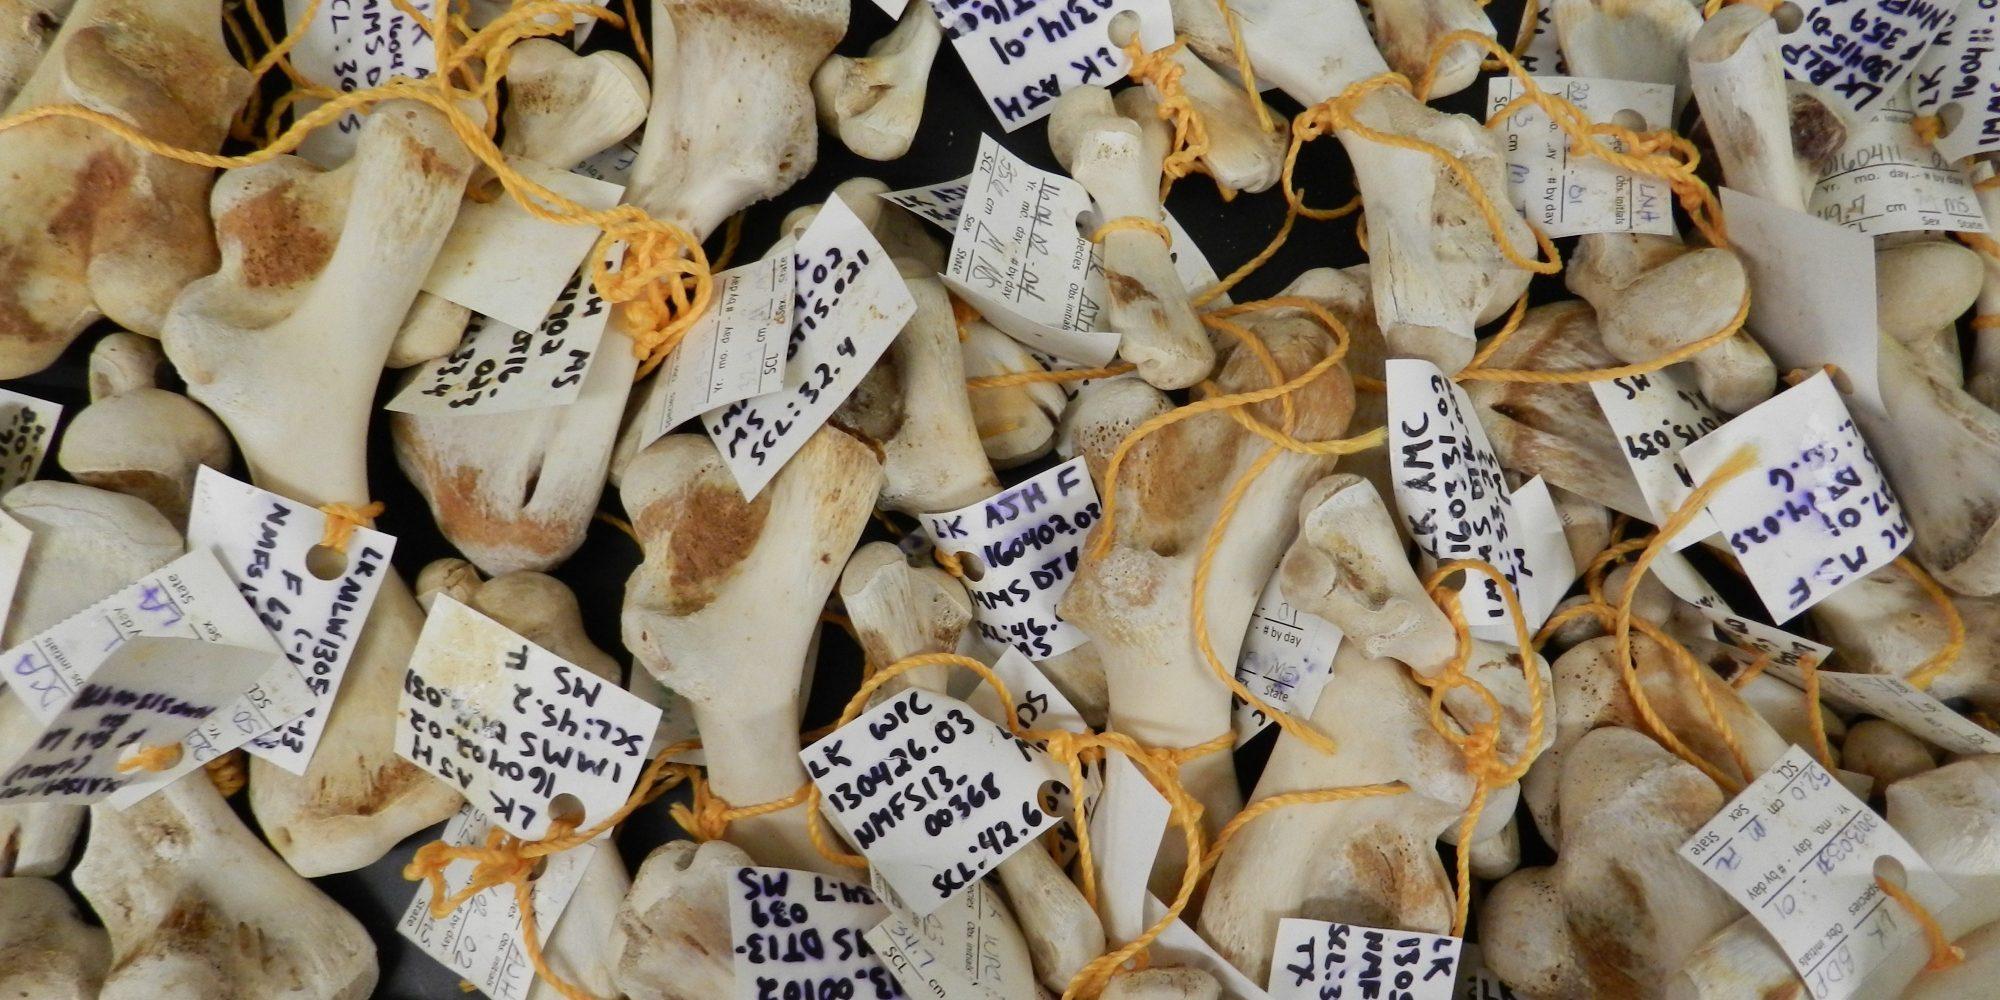 Kemp's ridley sea turtle humerus bones